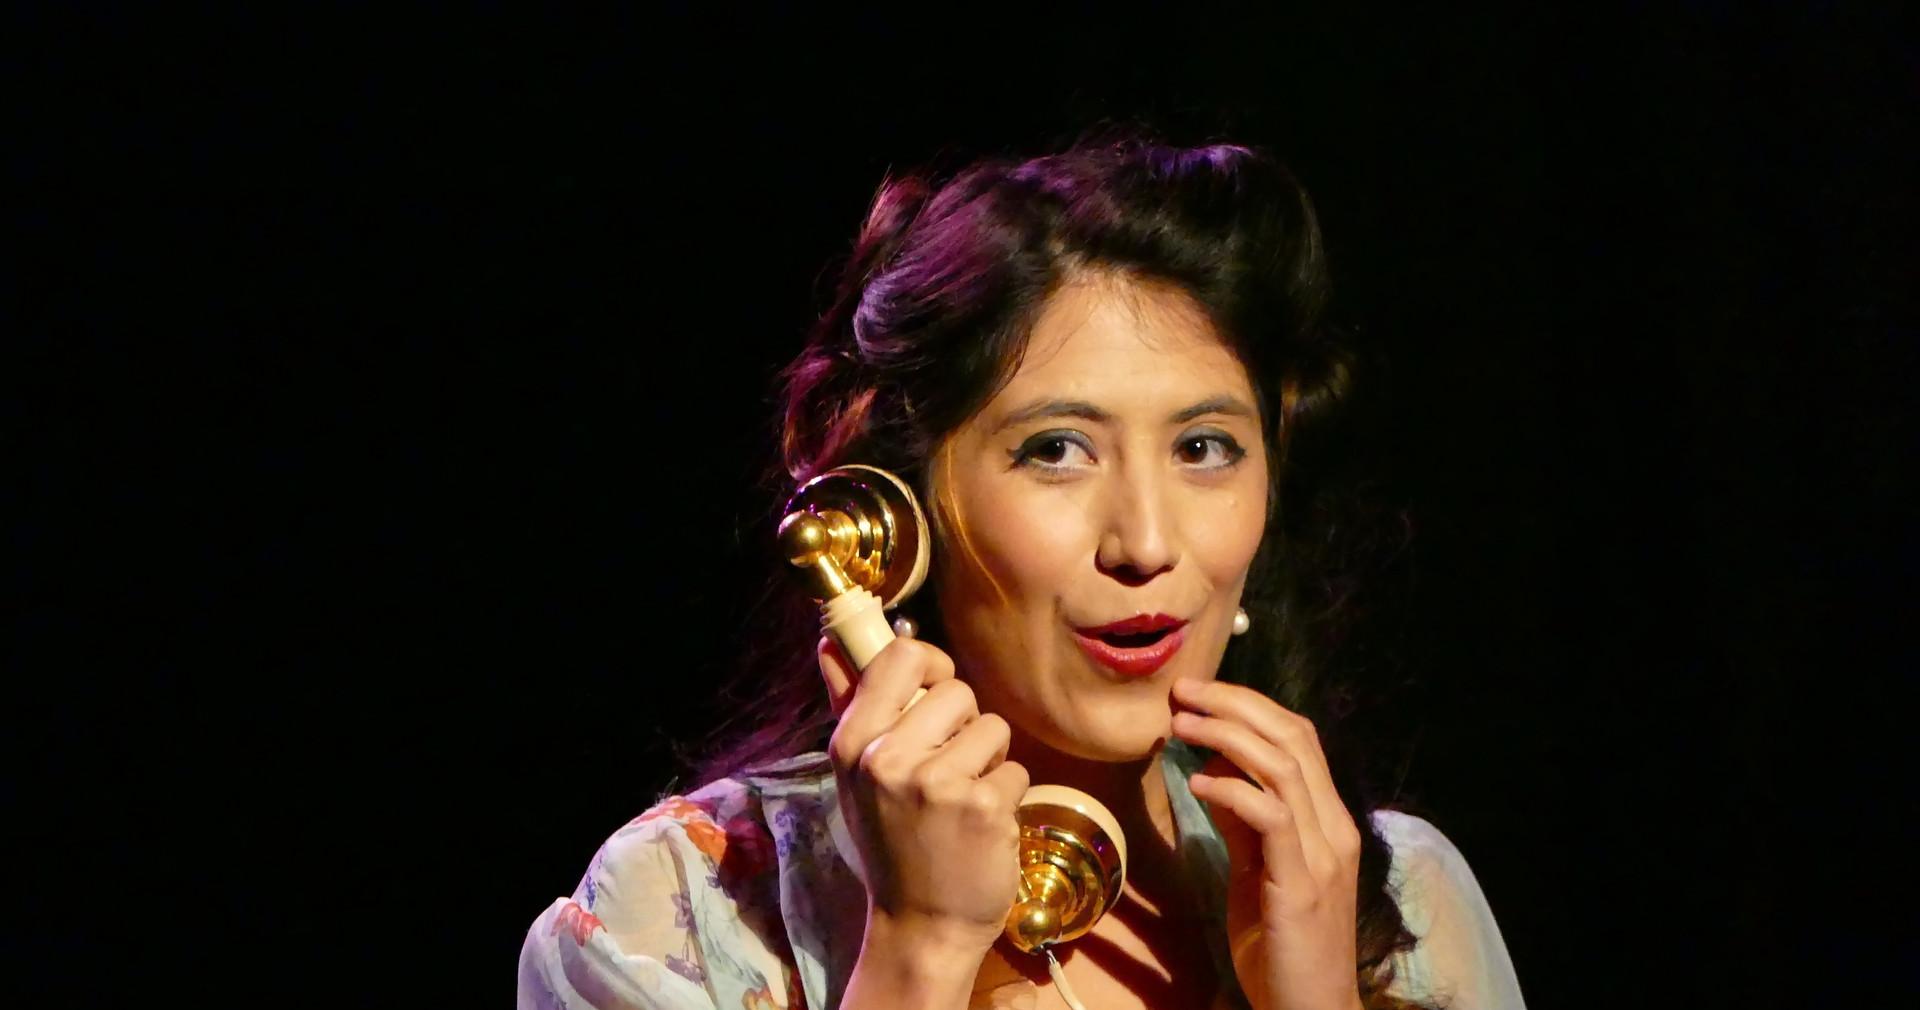 The Telephone '17